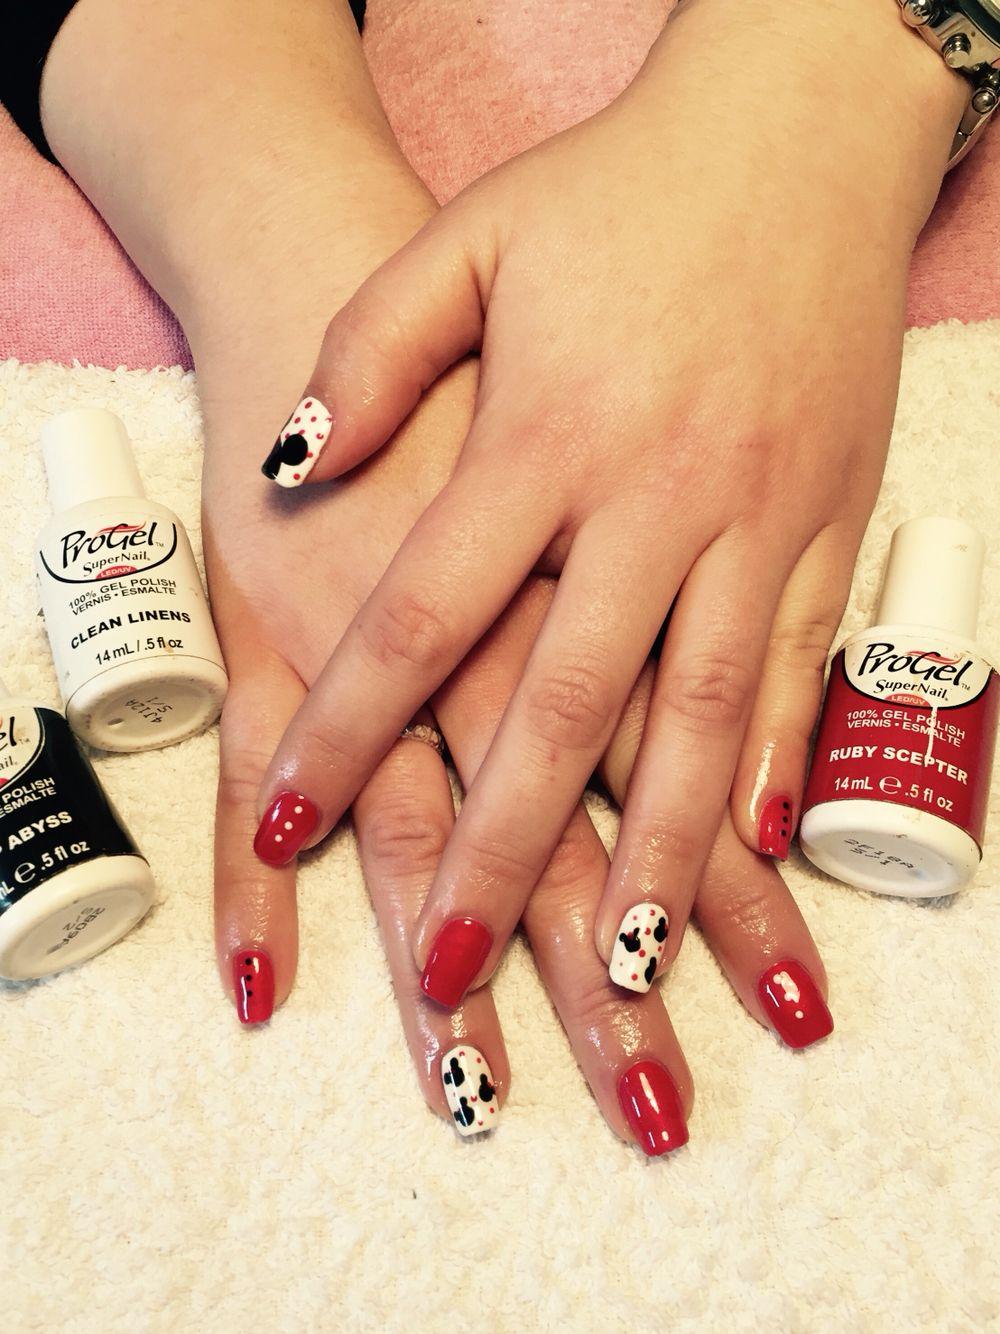 Mickey mouse supernail professional progel nail art X | Gel nail art ...